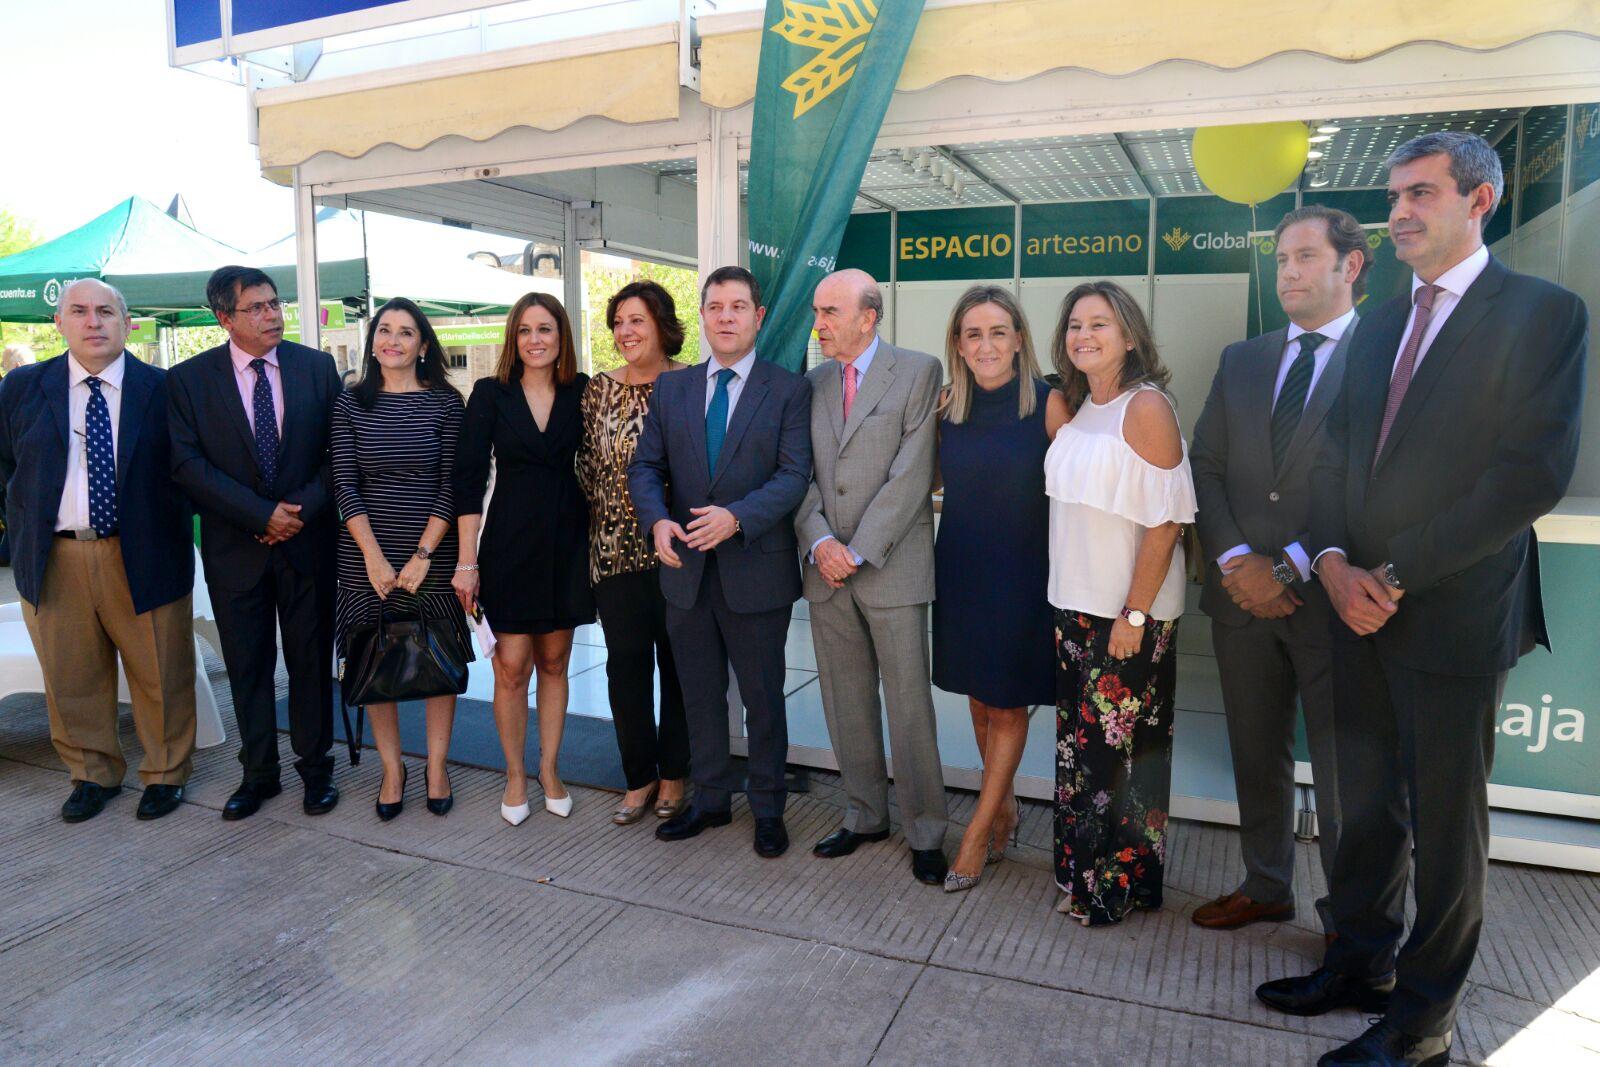 GLOBALCAJA, PRESENTE EN FARCAMA, CON TALLERES DE BARRO Y TALLERES INFANTILES